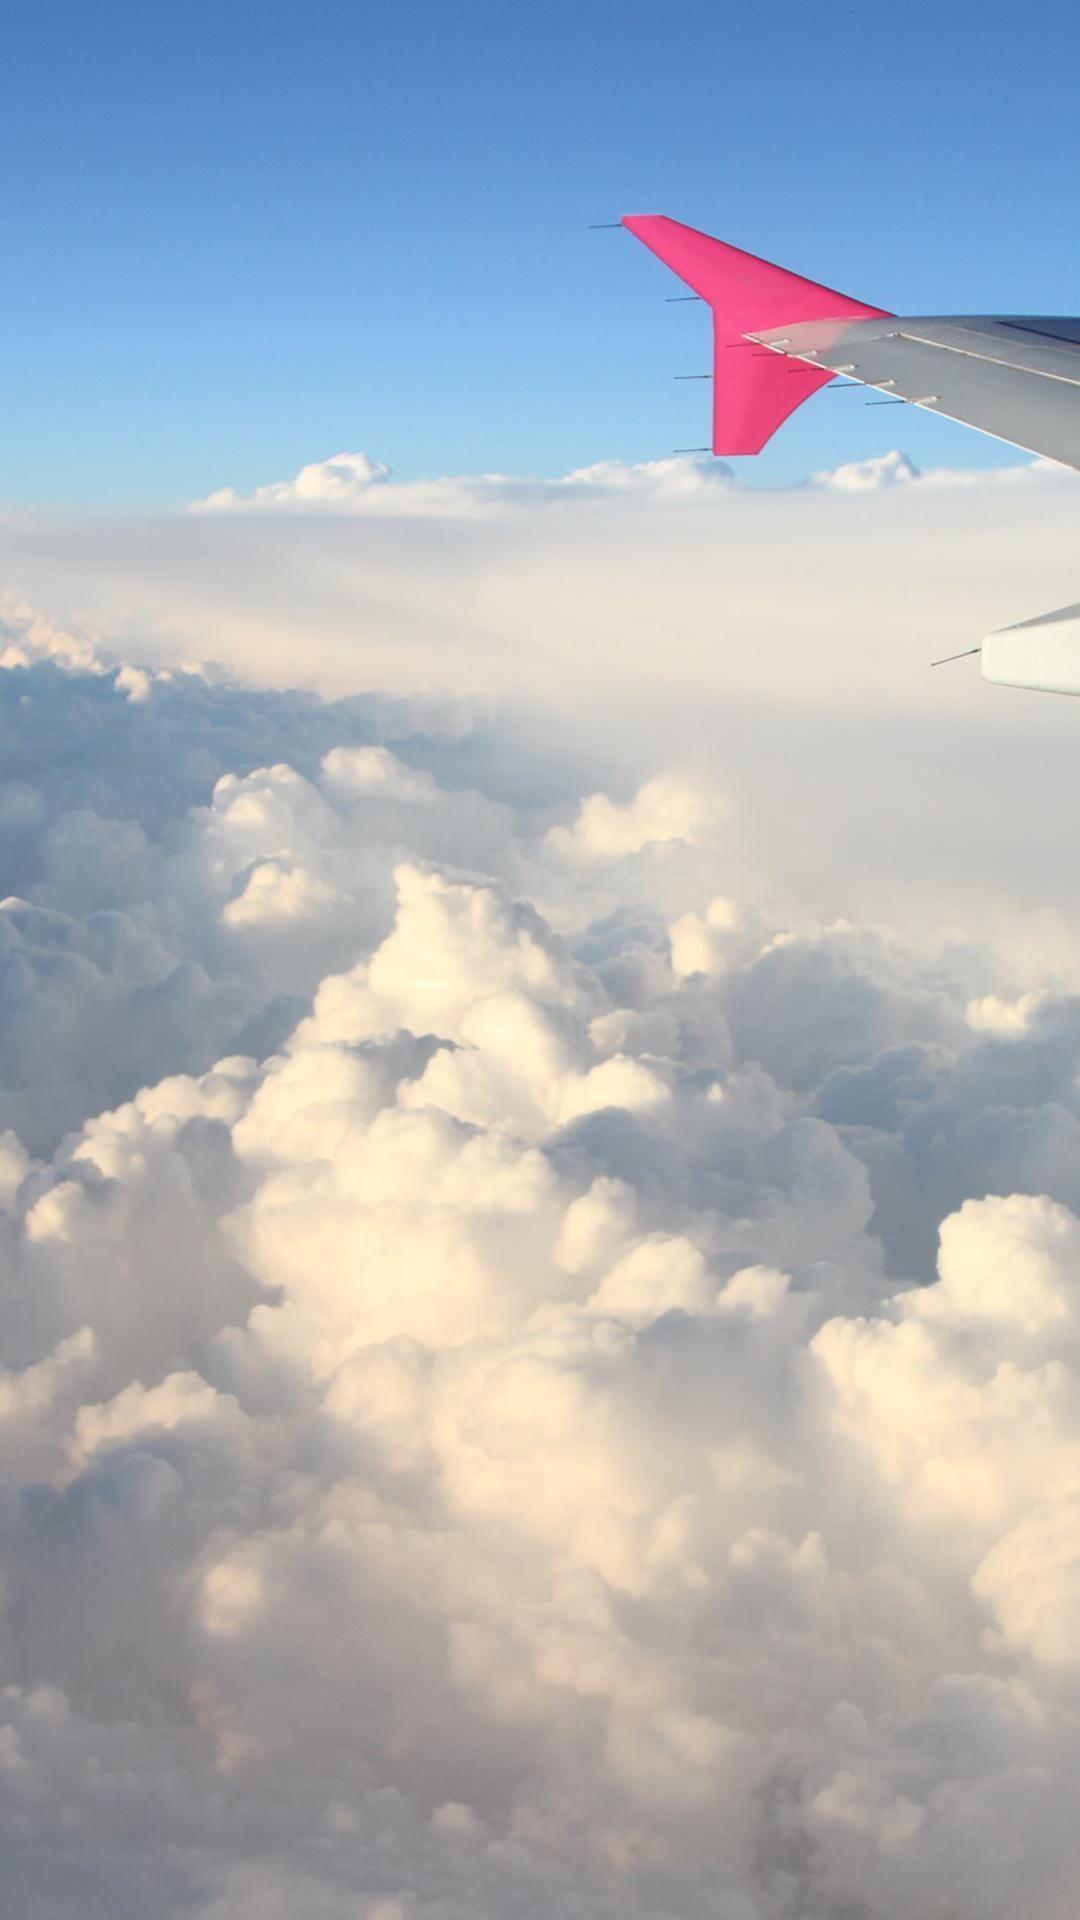 Wallpaper Iphone Airplane Wing Right Fond D Ecran Avion Arriere Plan Arriere Plans Iphone